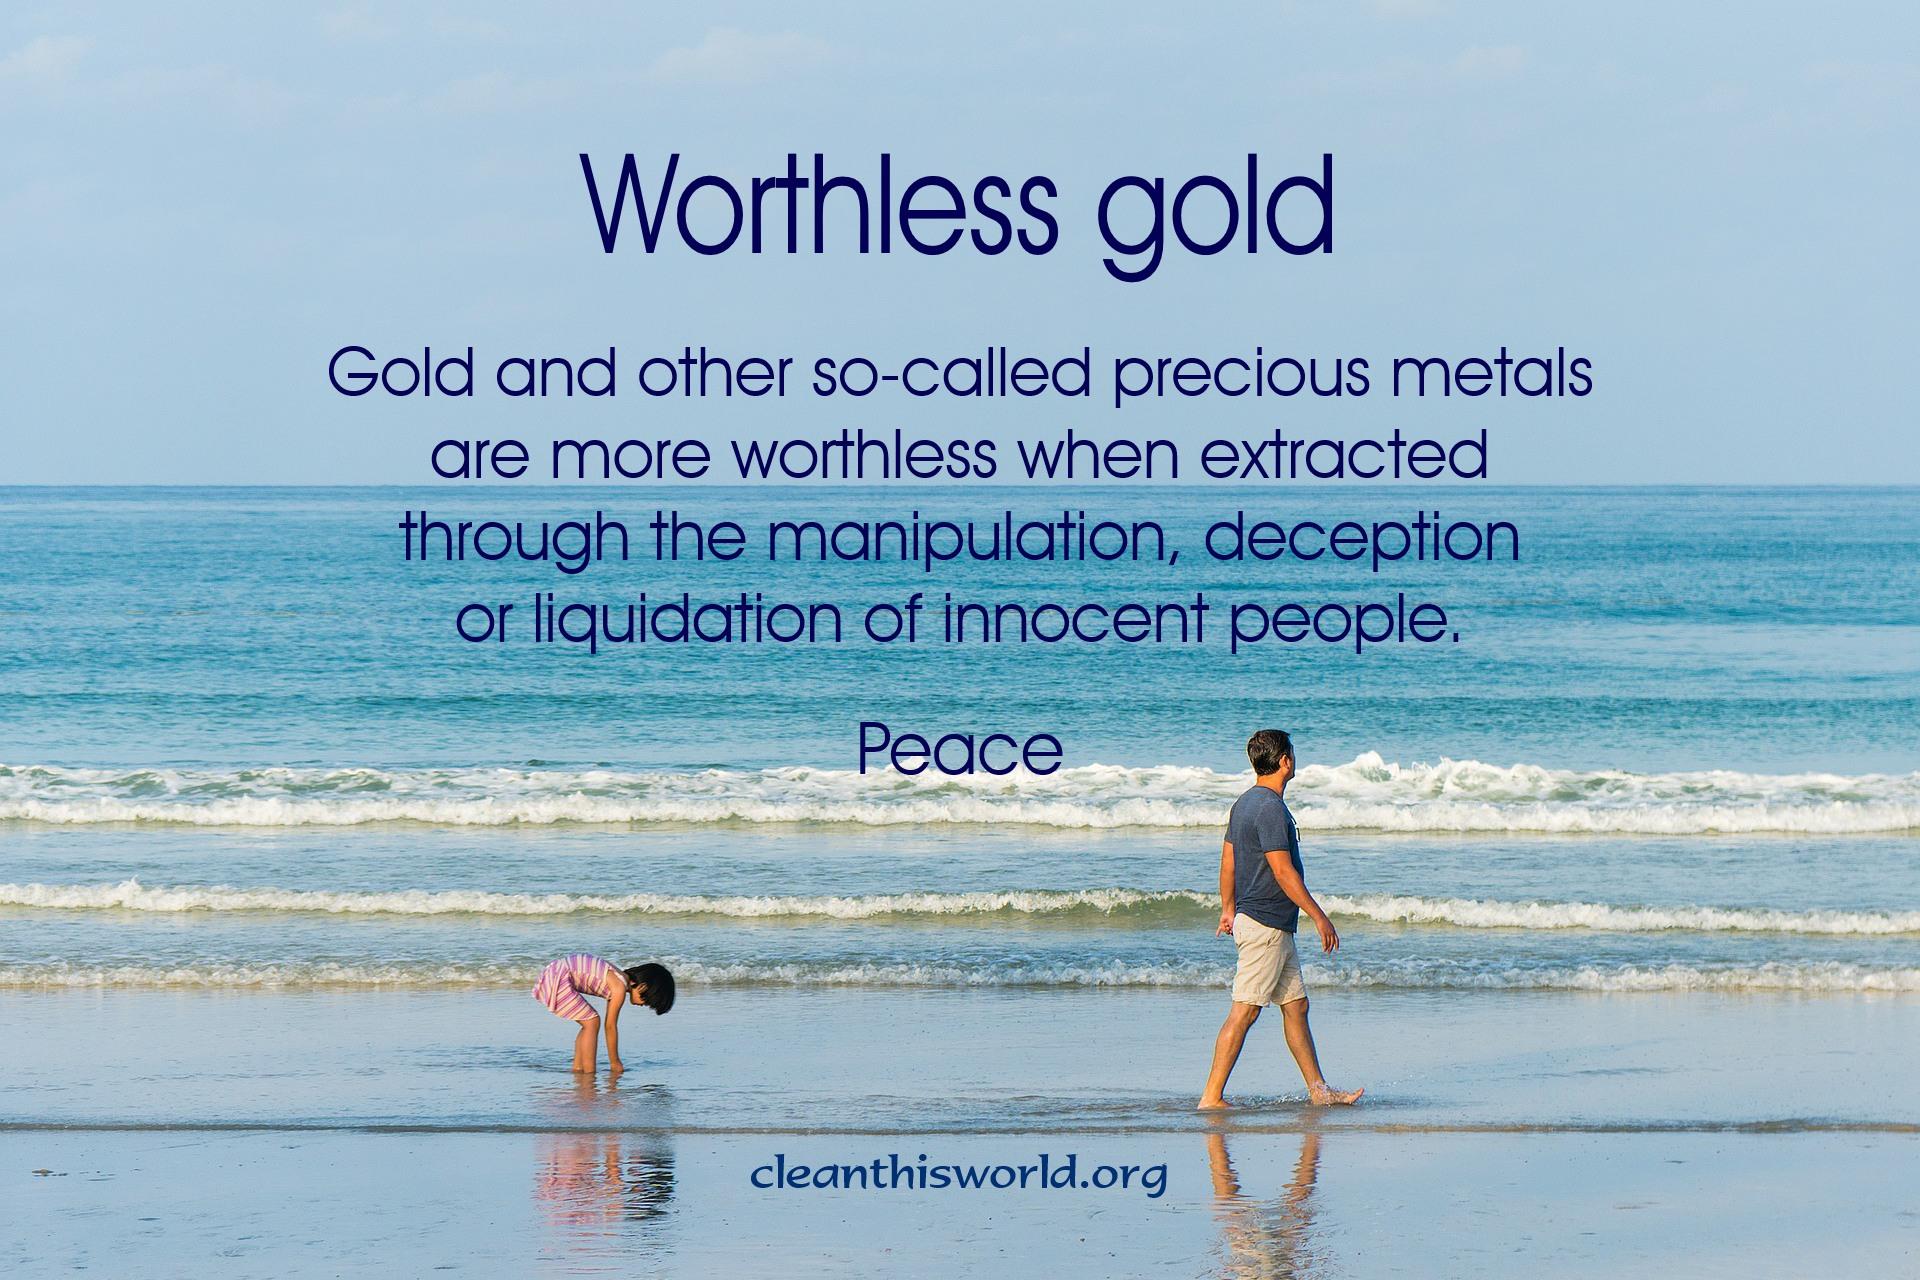 Worthless gold